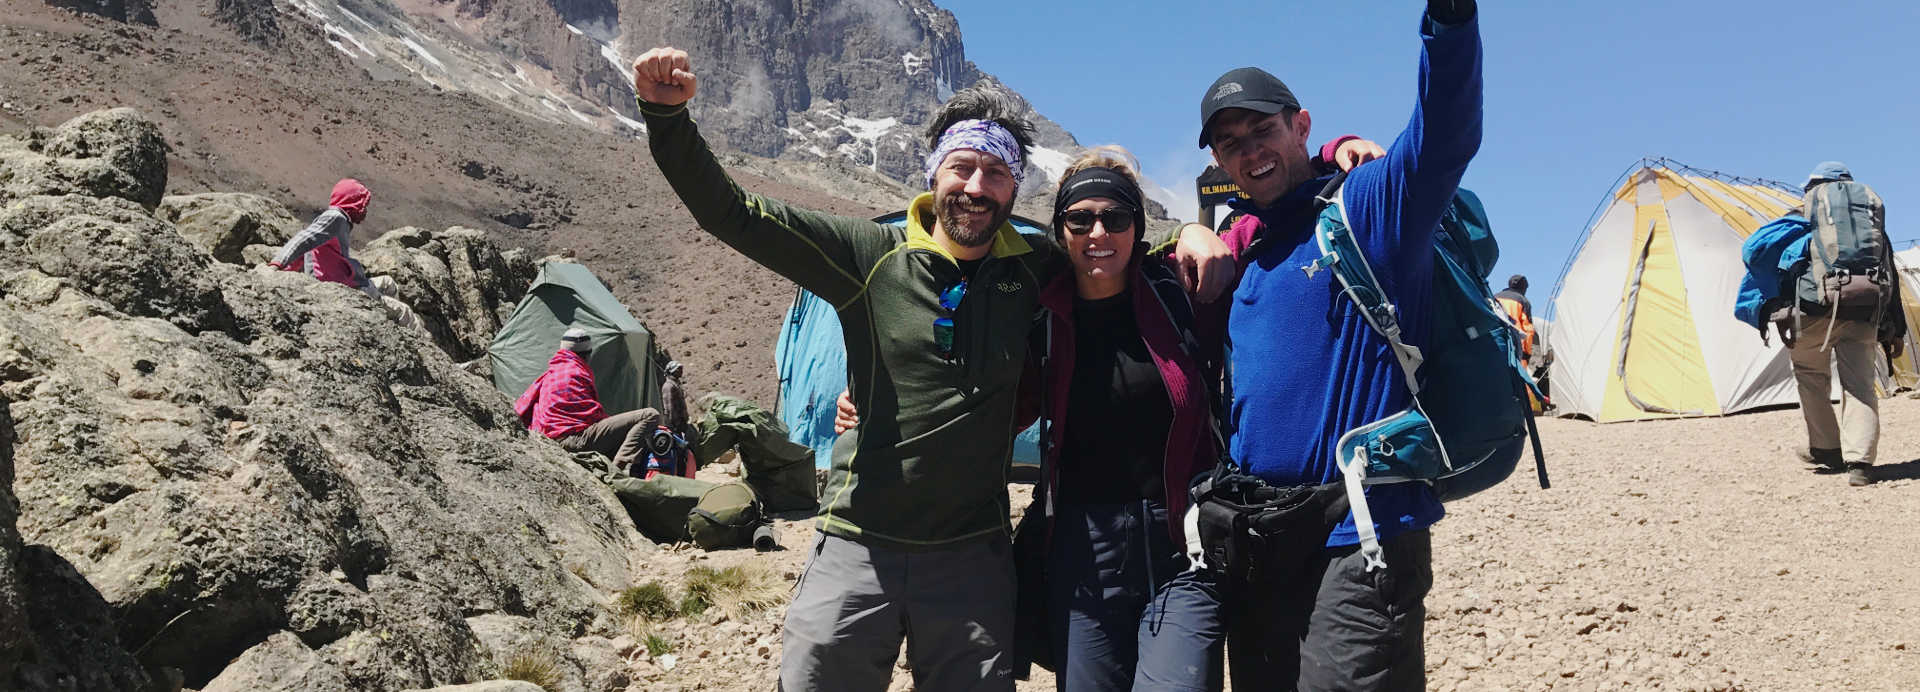 Kilimanjaro group